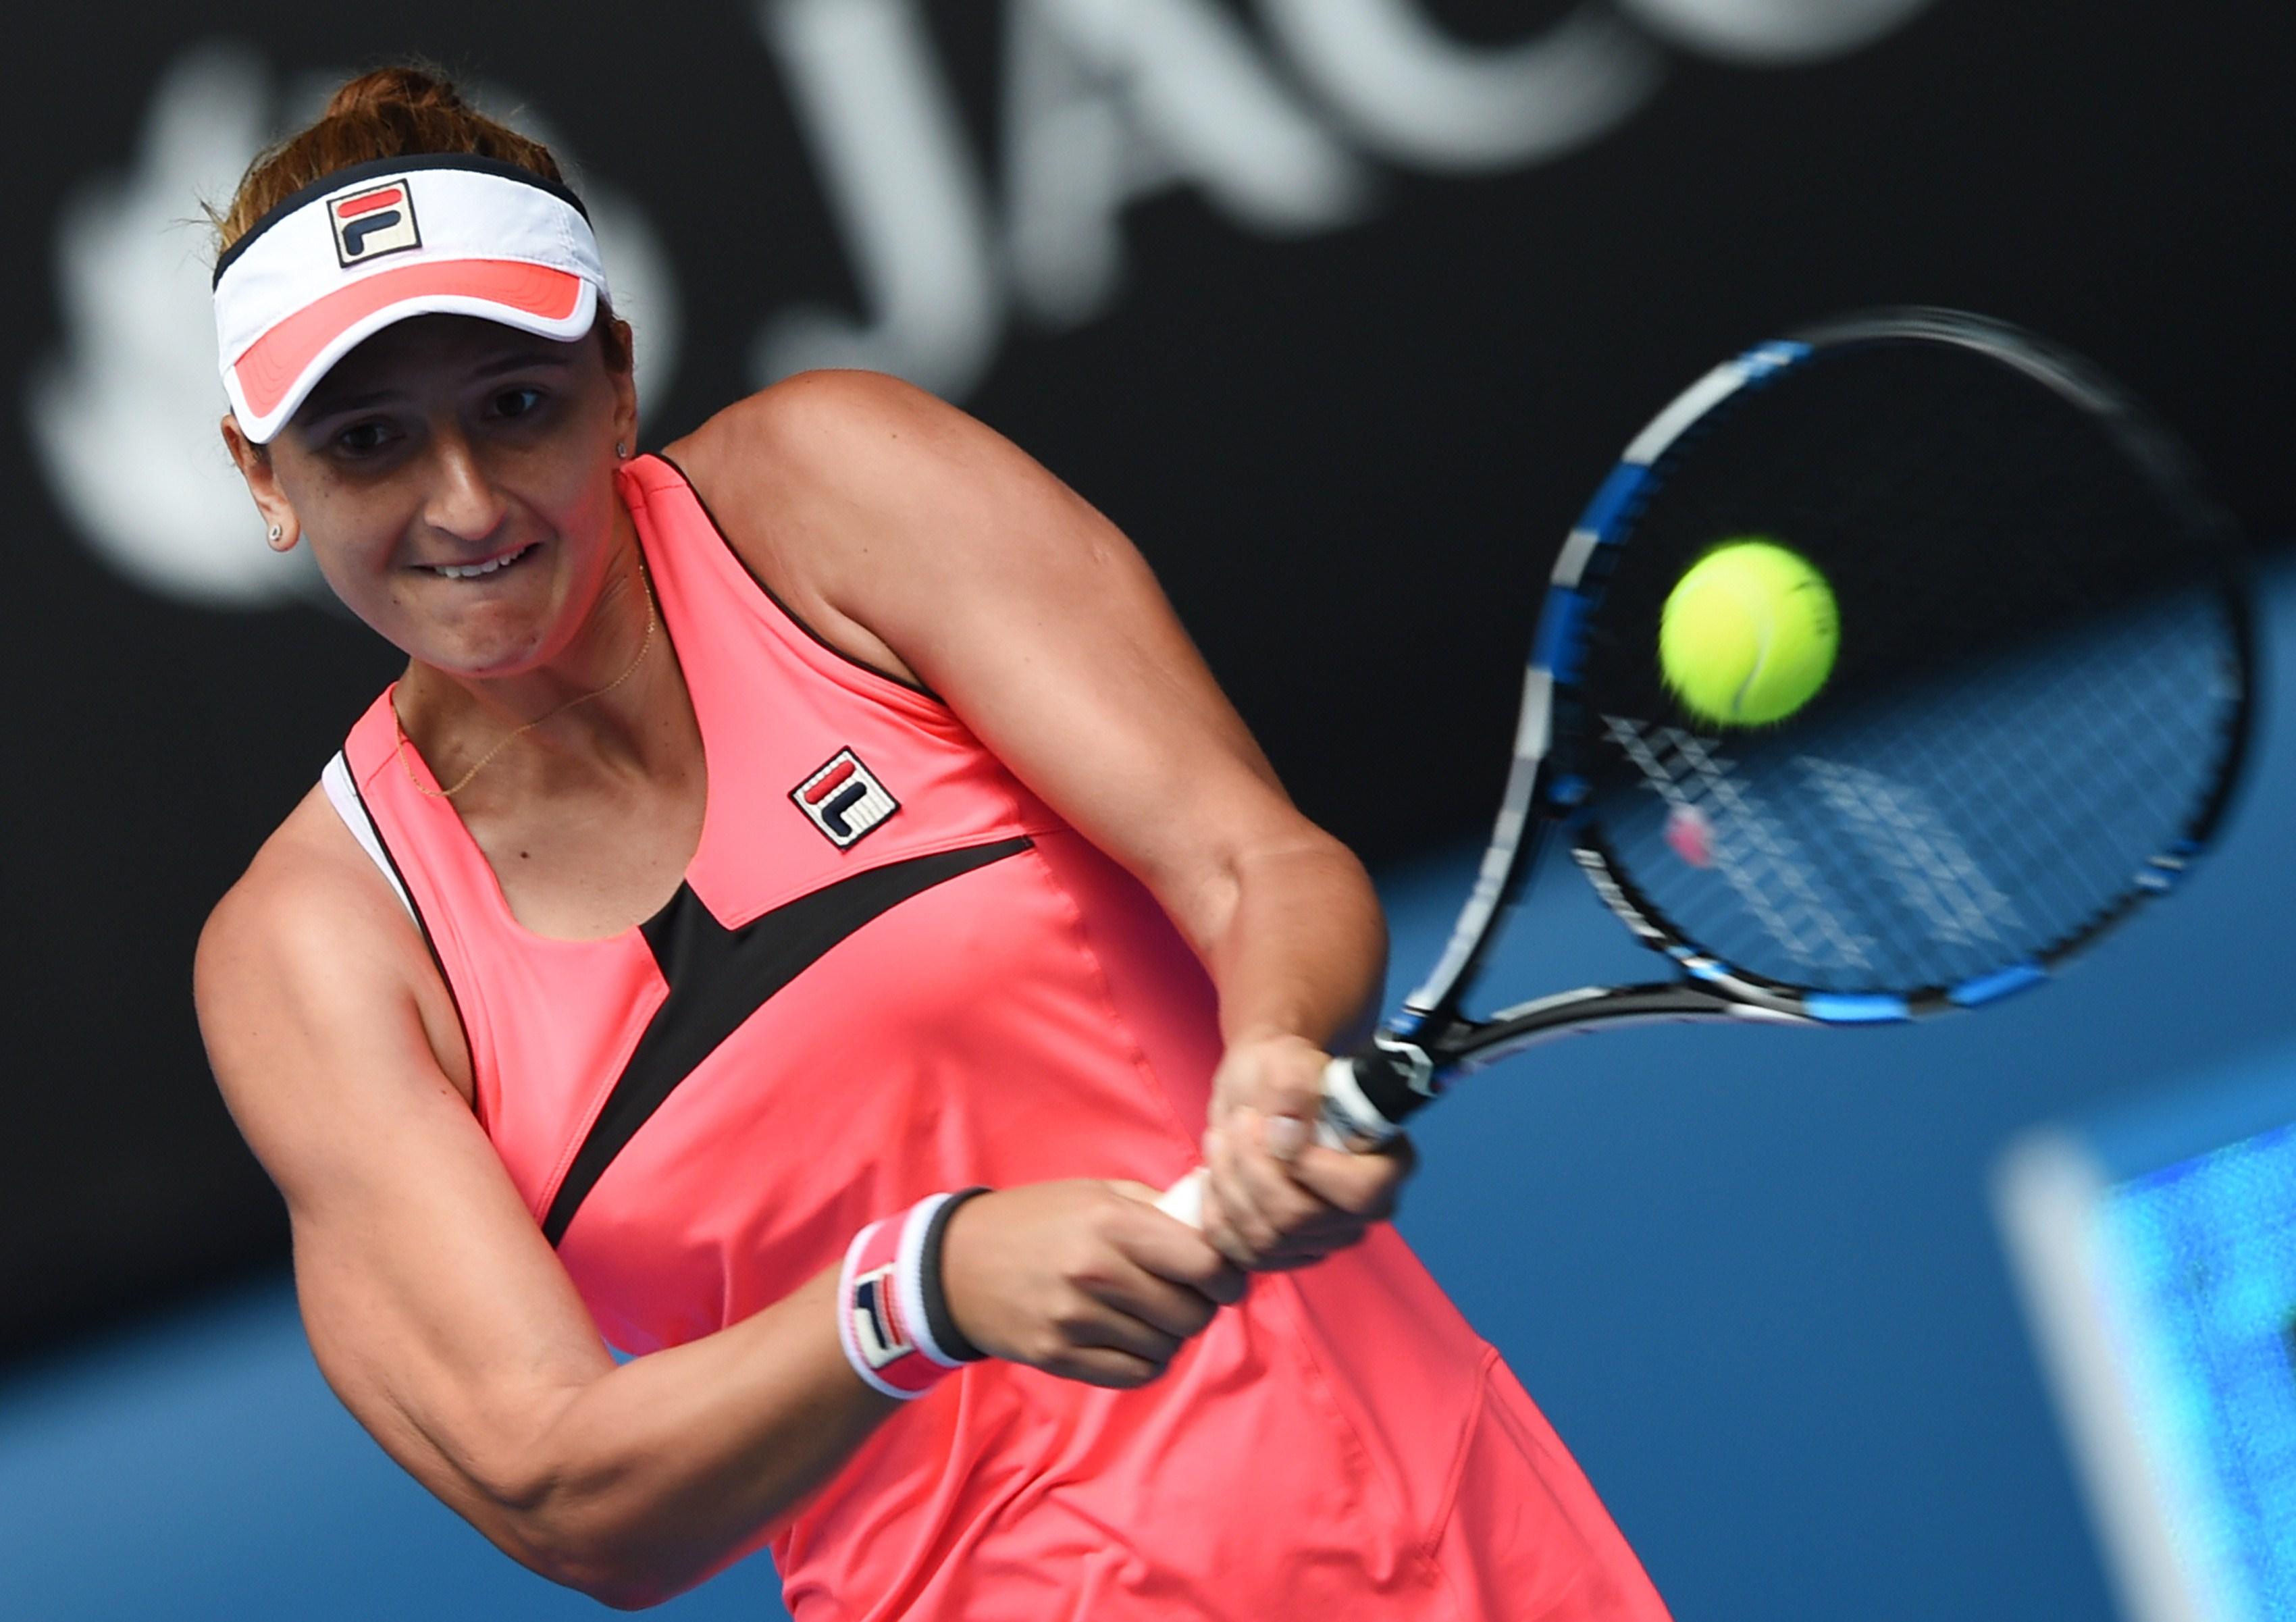 Irina Begu a fost eliminata in optimile Australian Open. Romanca a fost invinsa de Eugenie Bouchard, scor 1-6, 7-5, 2-6